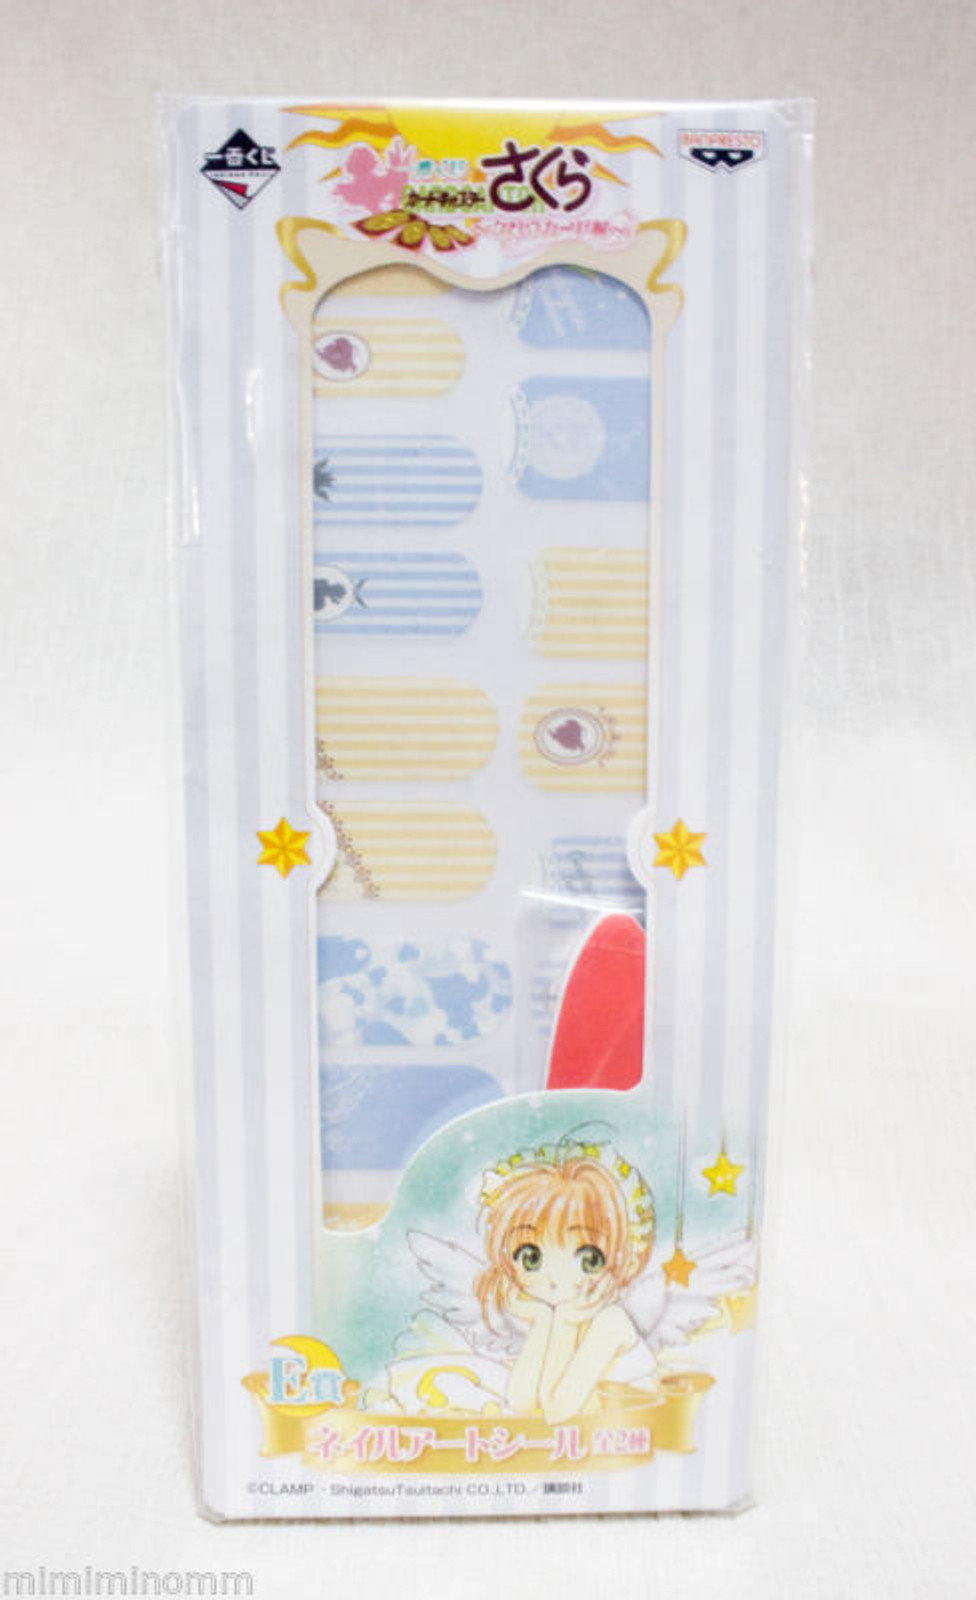 Cardcaptor Sakura Nail Art Sticker Set CLAMP Banpresto JAPAN ANIME MANGA